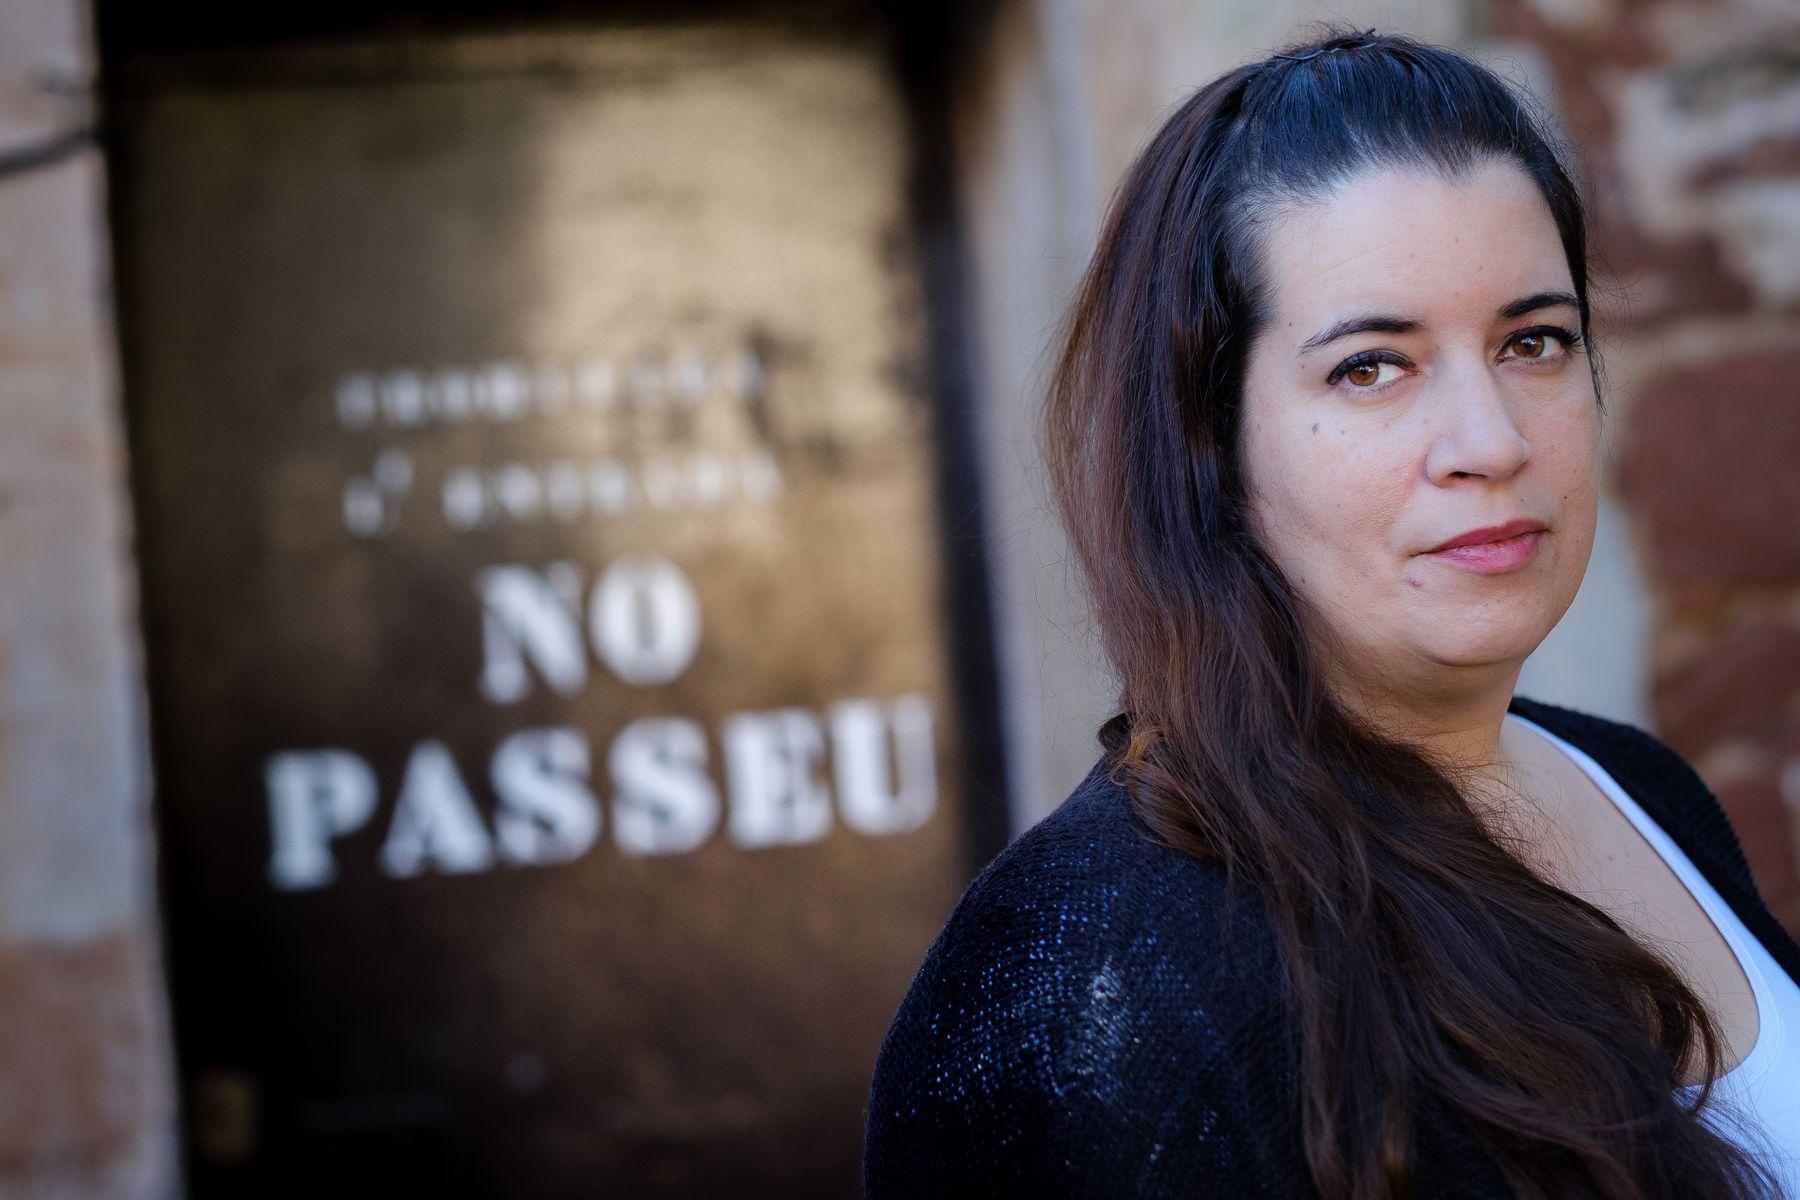 Argazkia: Jordi Borrás